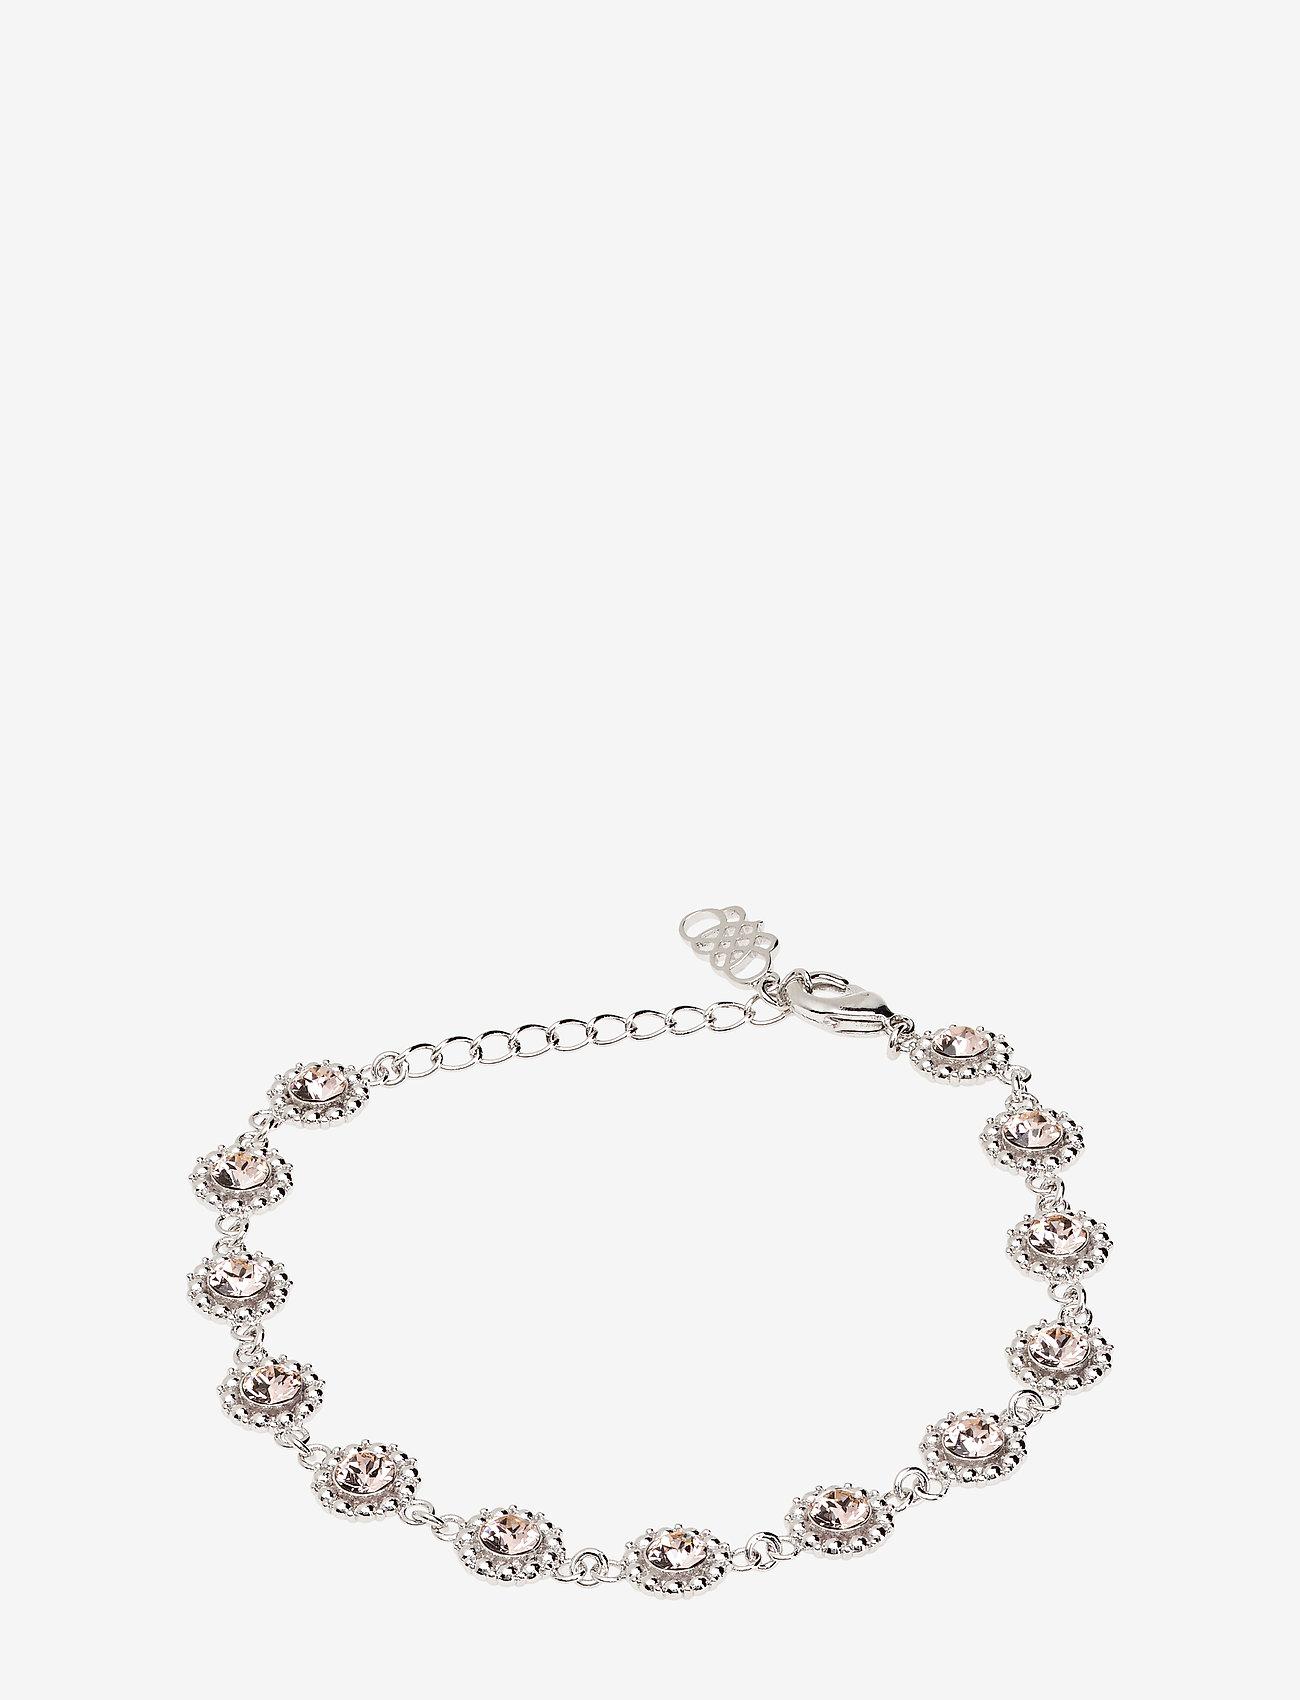 LILY AND ROSE - Petite Kate bracelet - Silk - dainty - silk